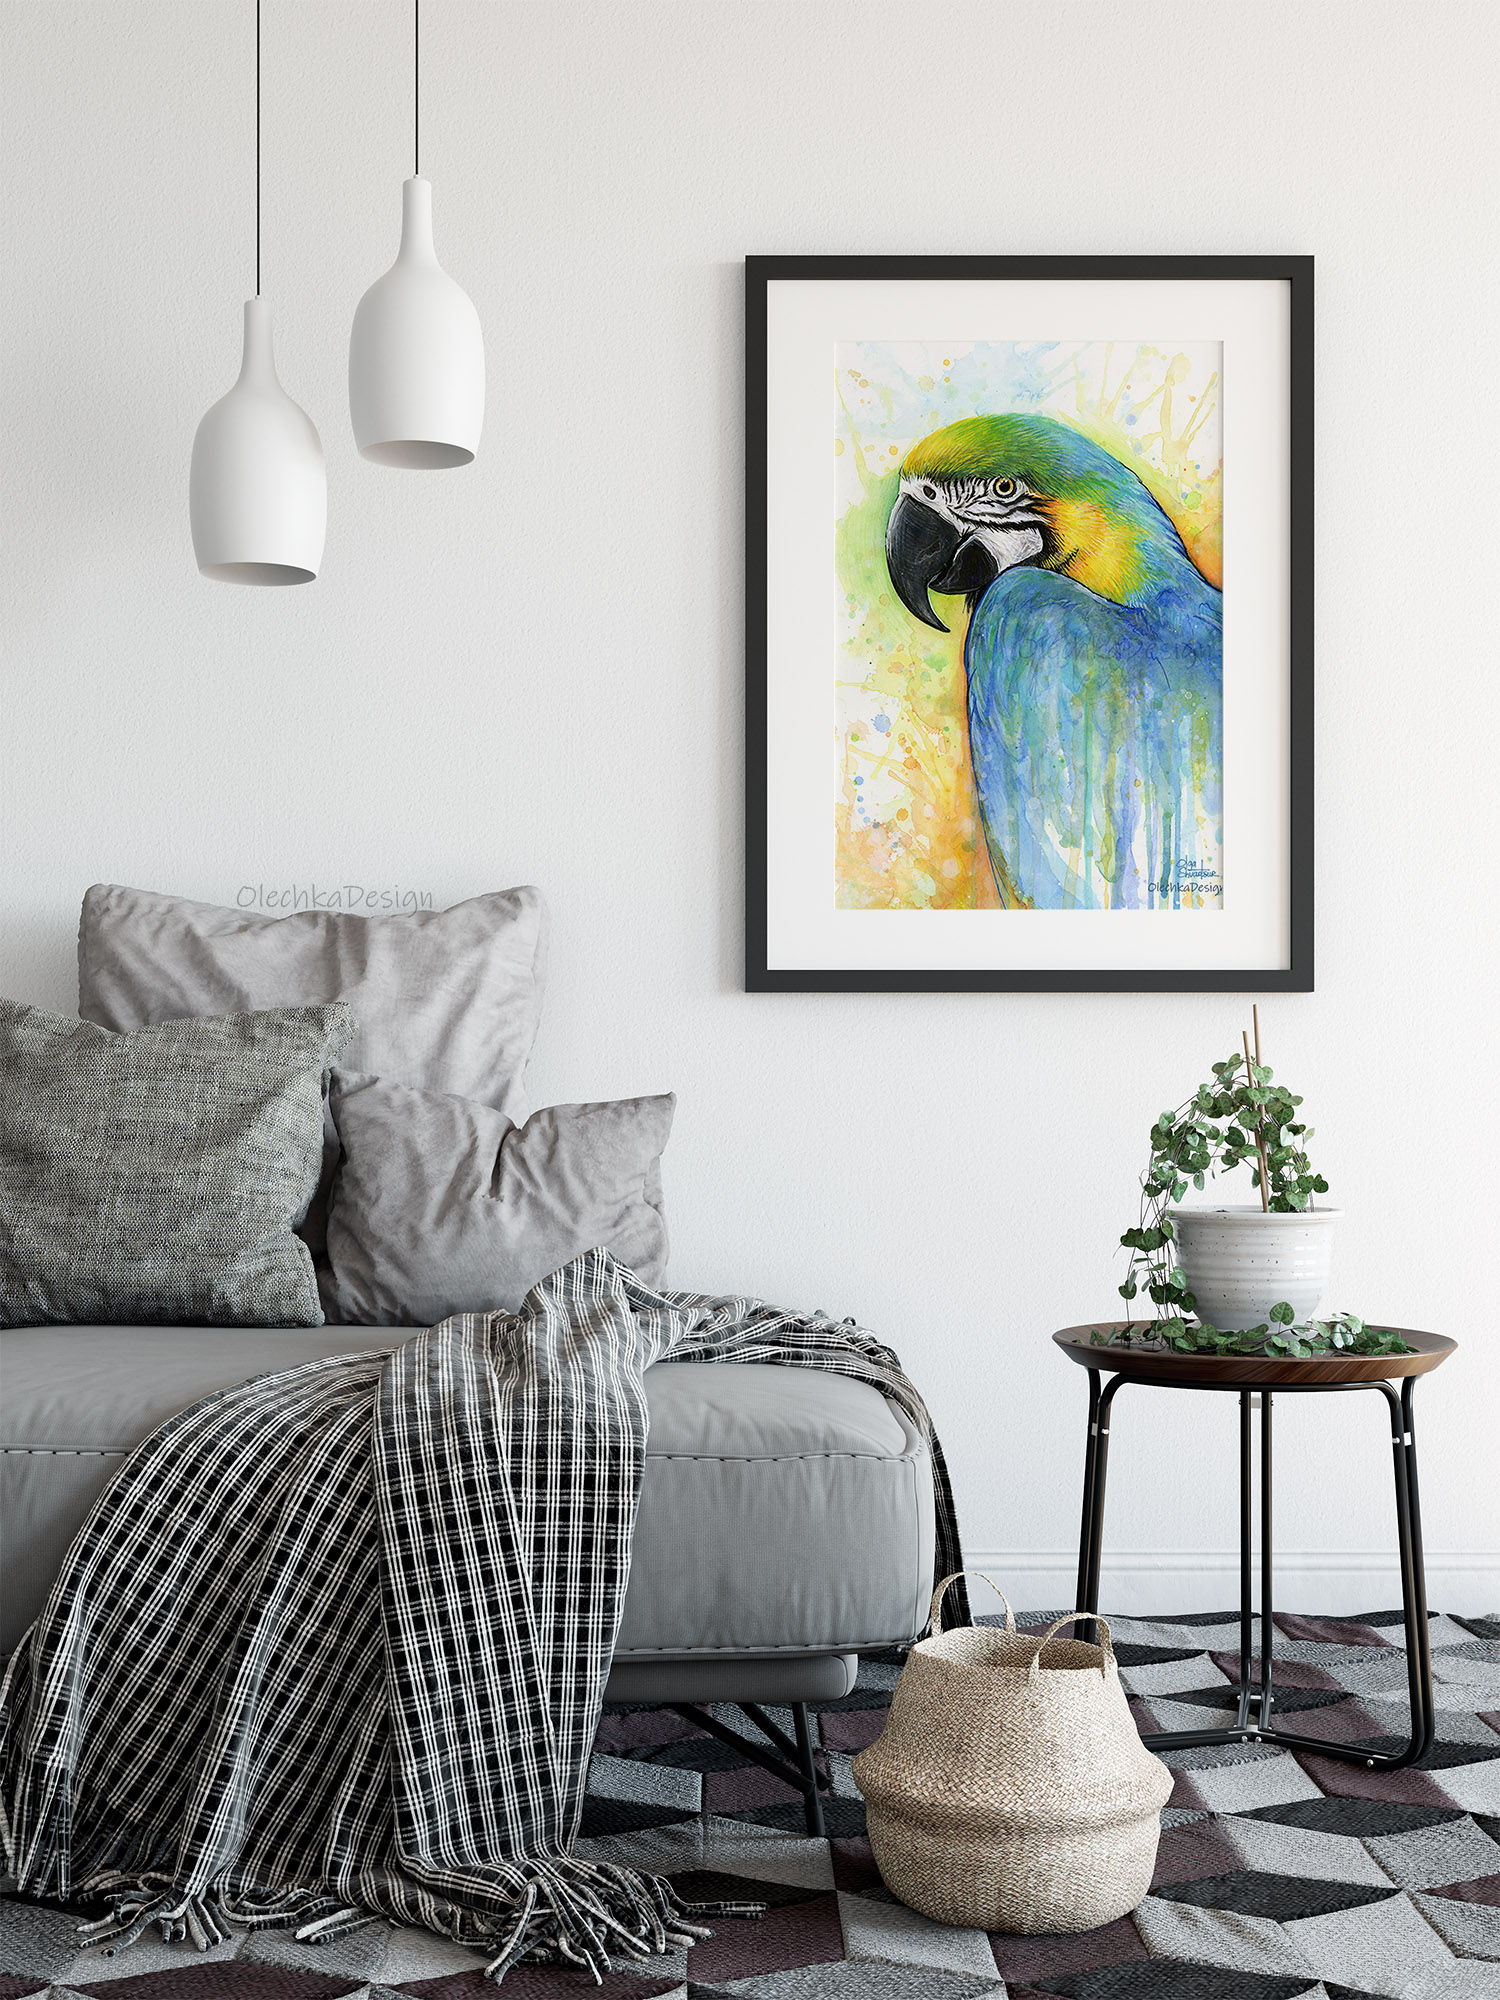 Macaw-wall-art.jpg